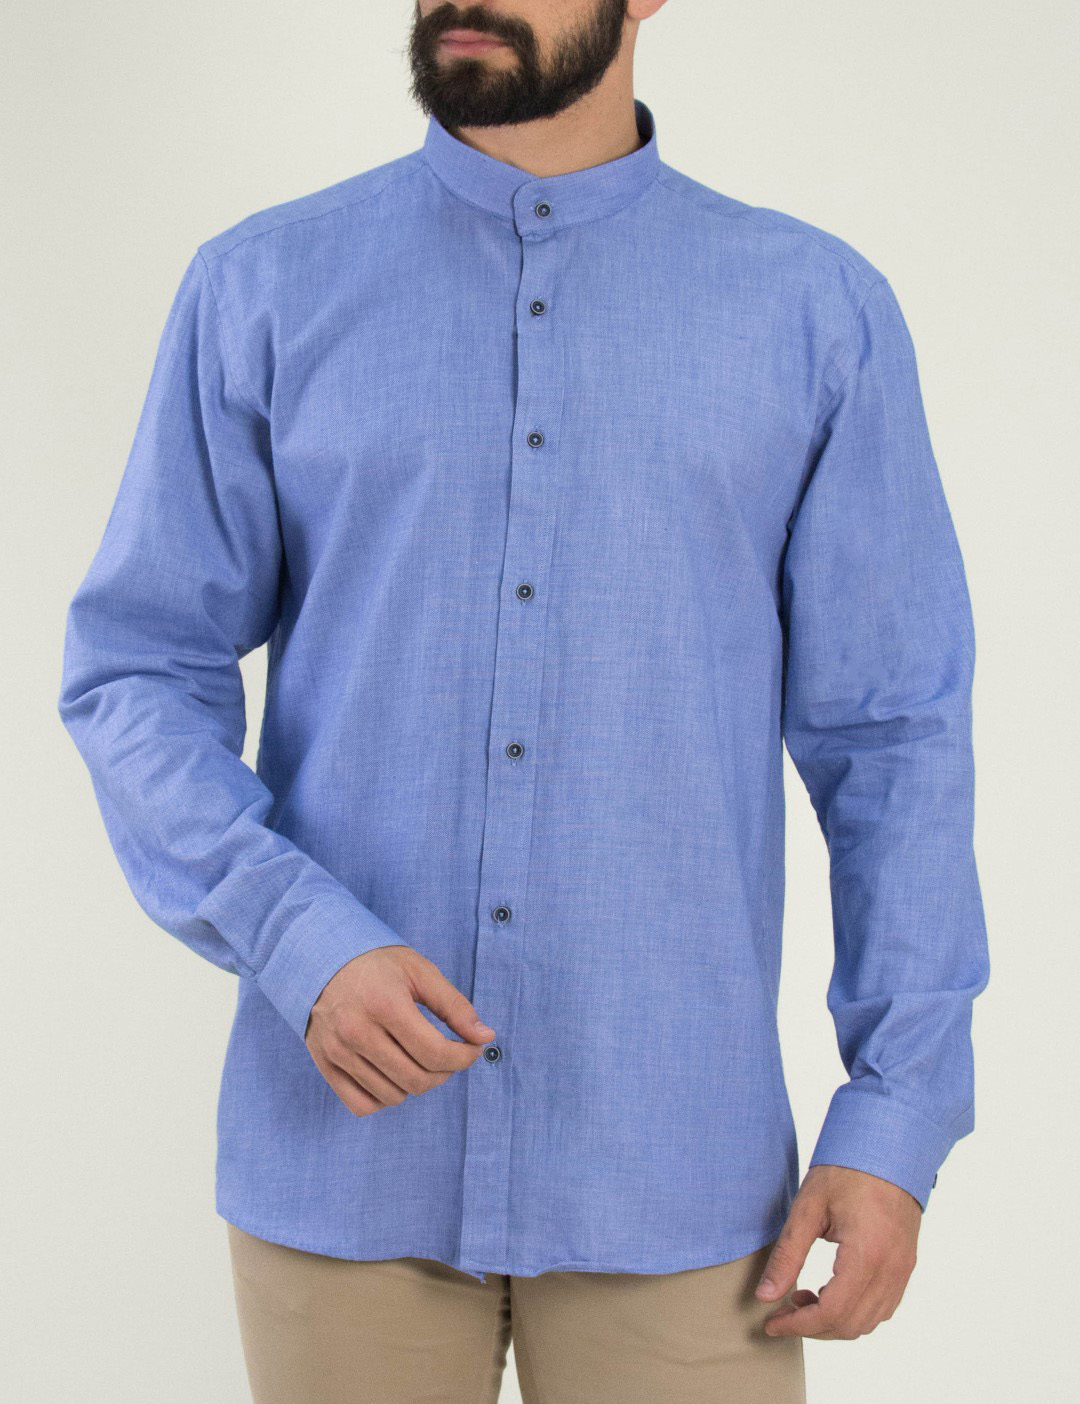 a5cfb7188ec Torouxo Ανδρικό σιελ πουκάμισο με μάο γιακά Firenze 0191120